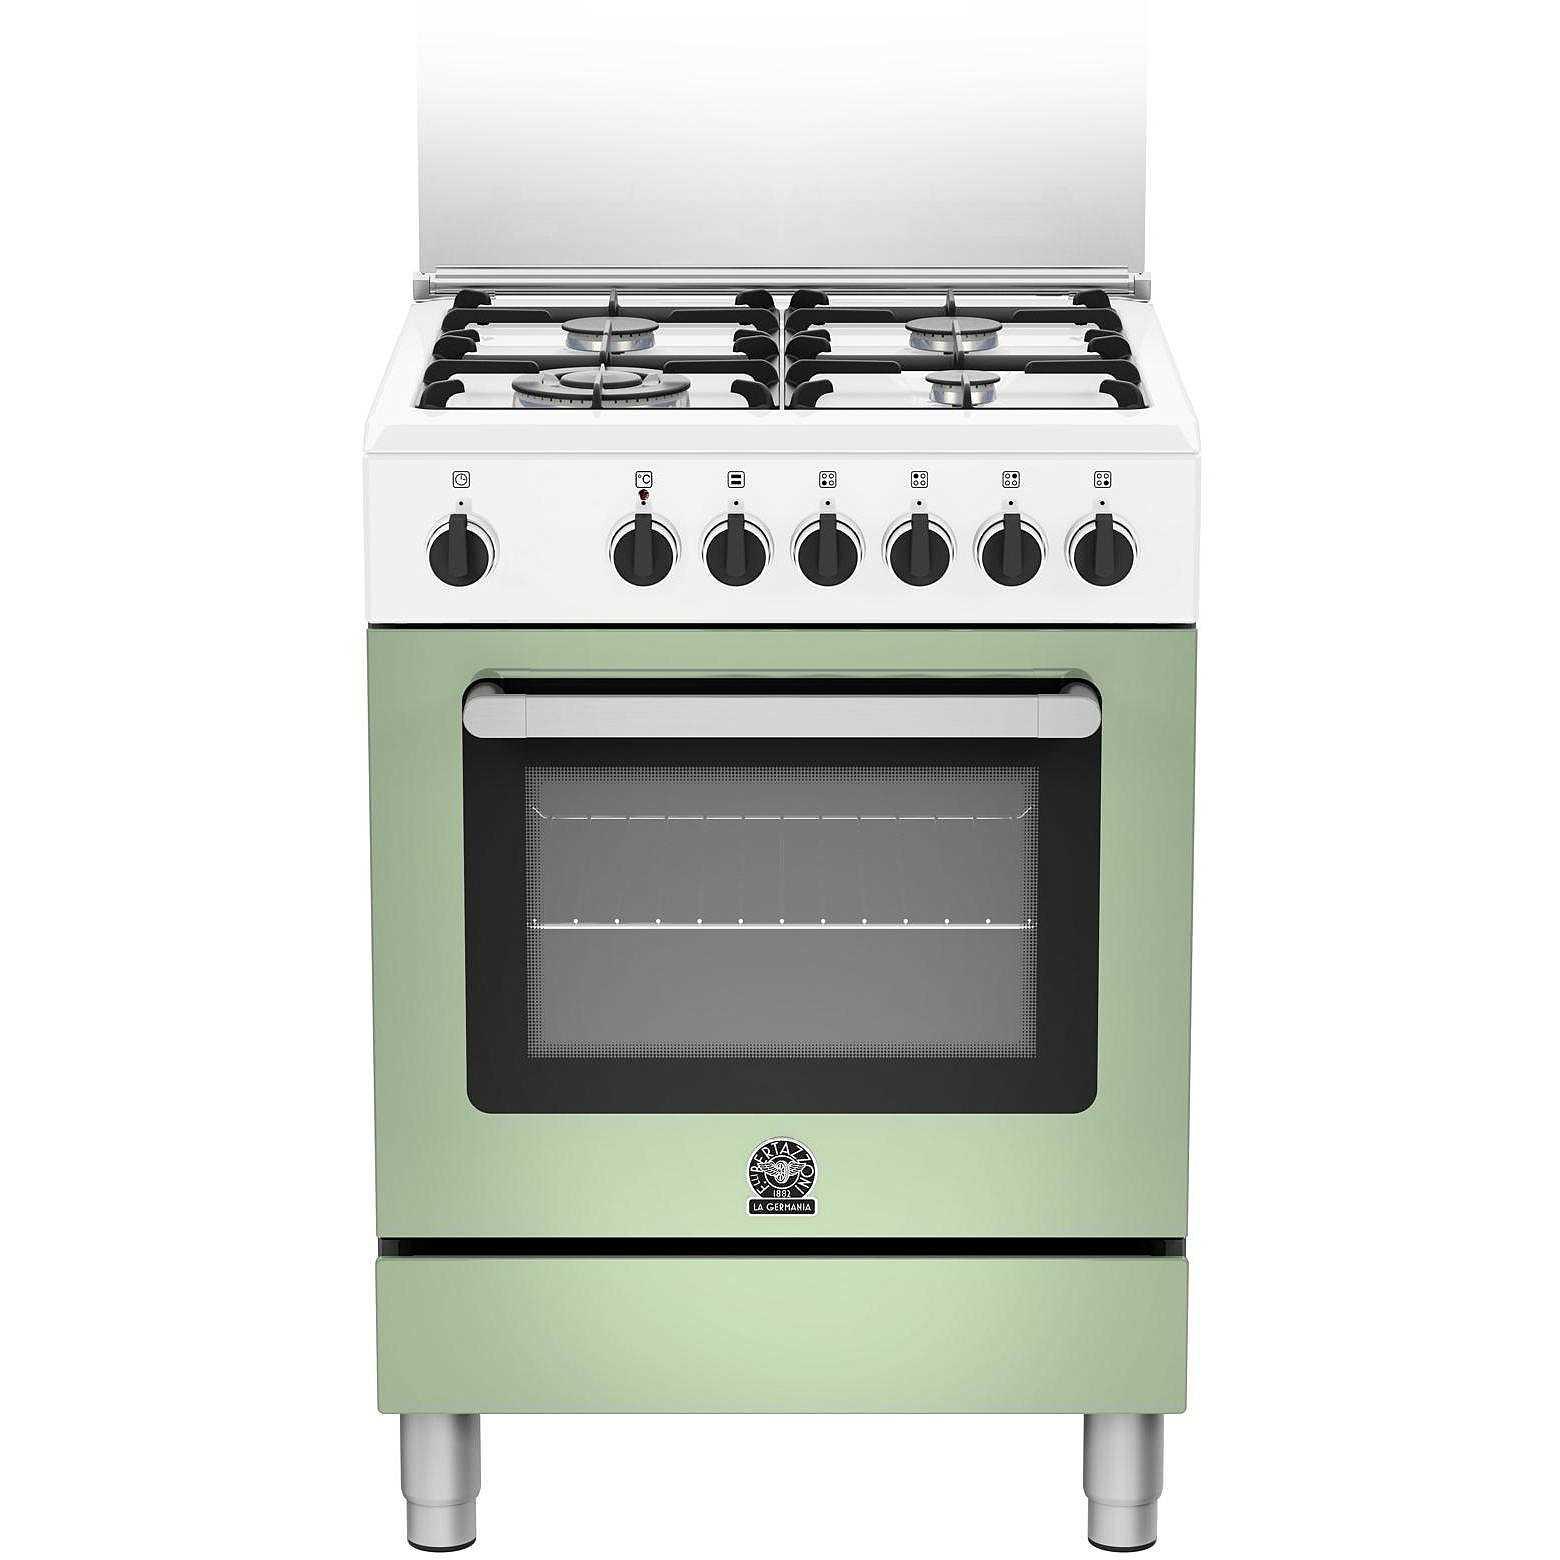 La germania ri64c61cwv cucina 60x60 4 fuochi a gas forno - La germania cucina ...